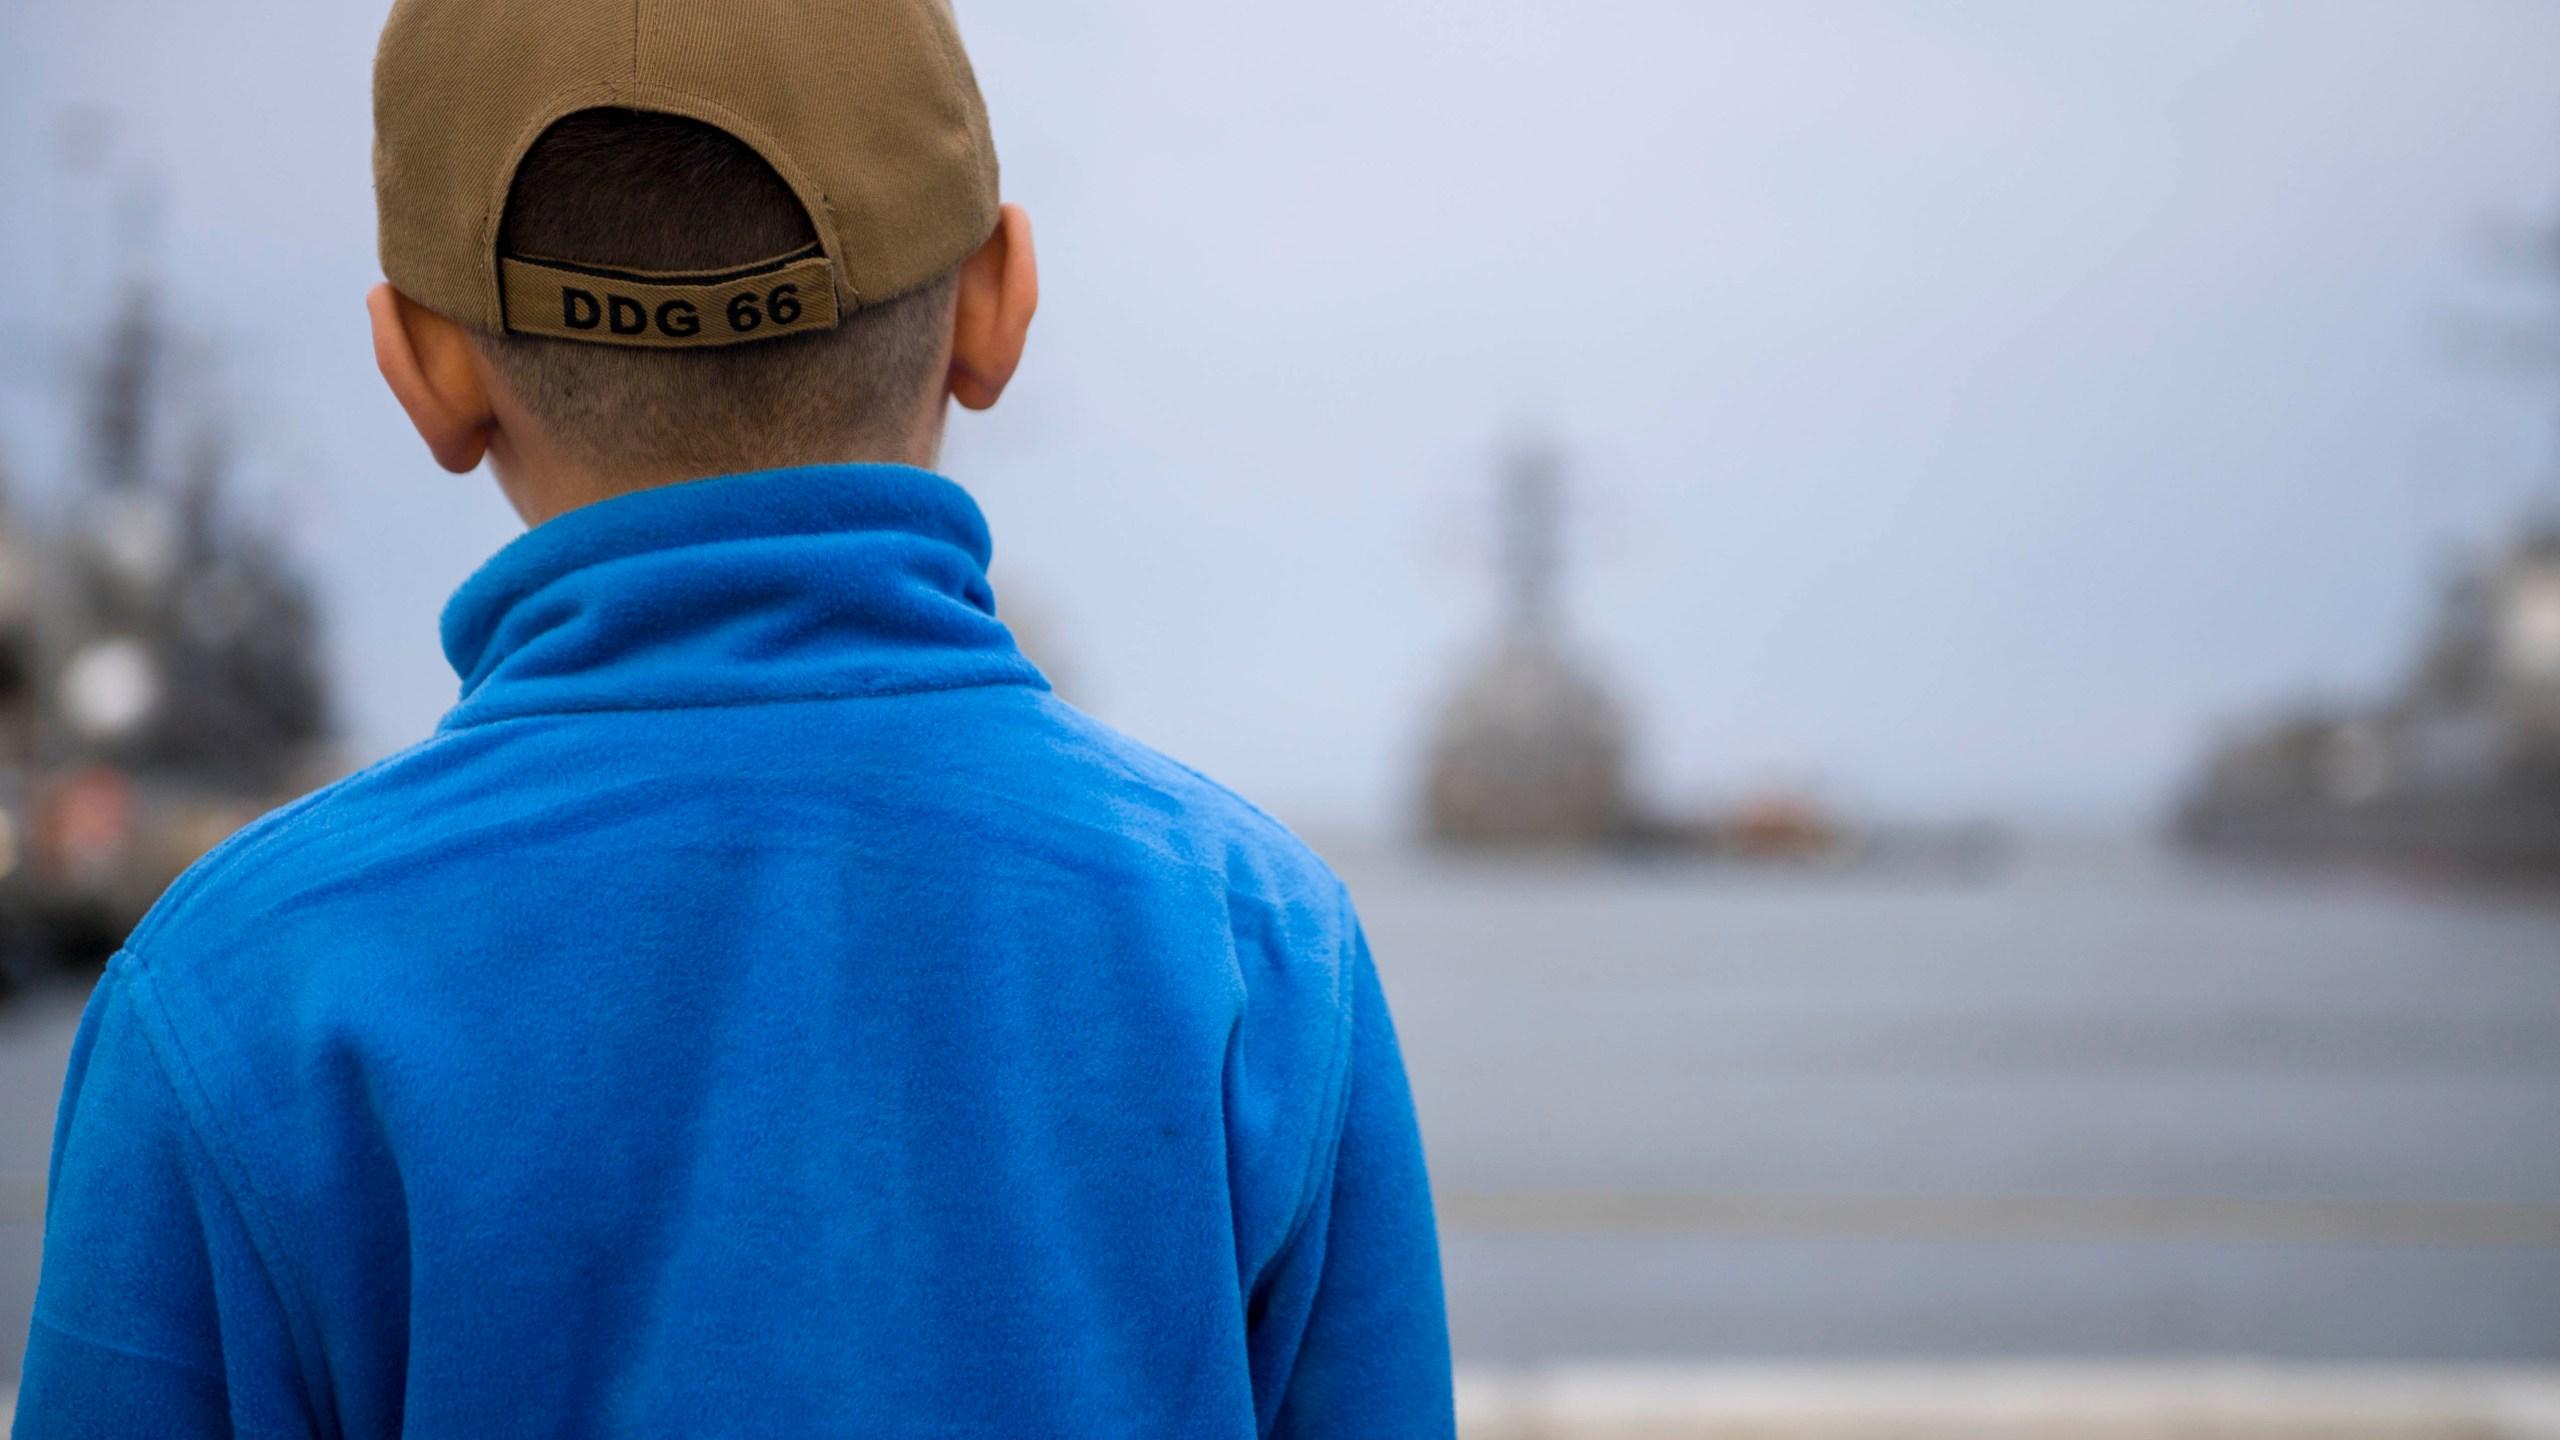 USS GONZALEZ DEPLOYS 1_1552662912226.jpg.jpg